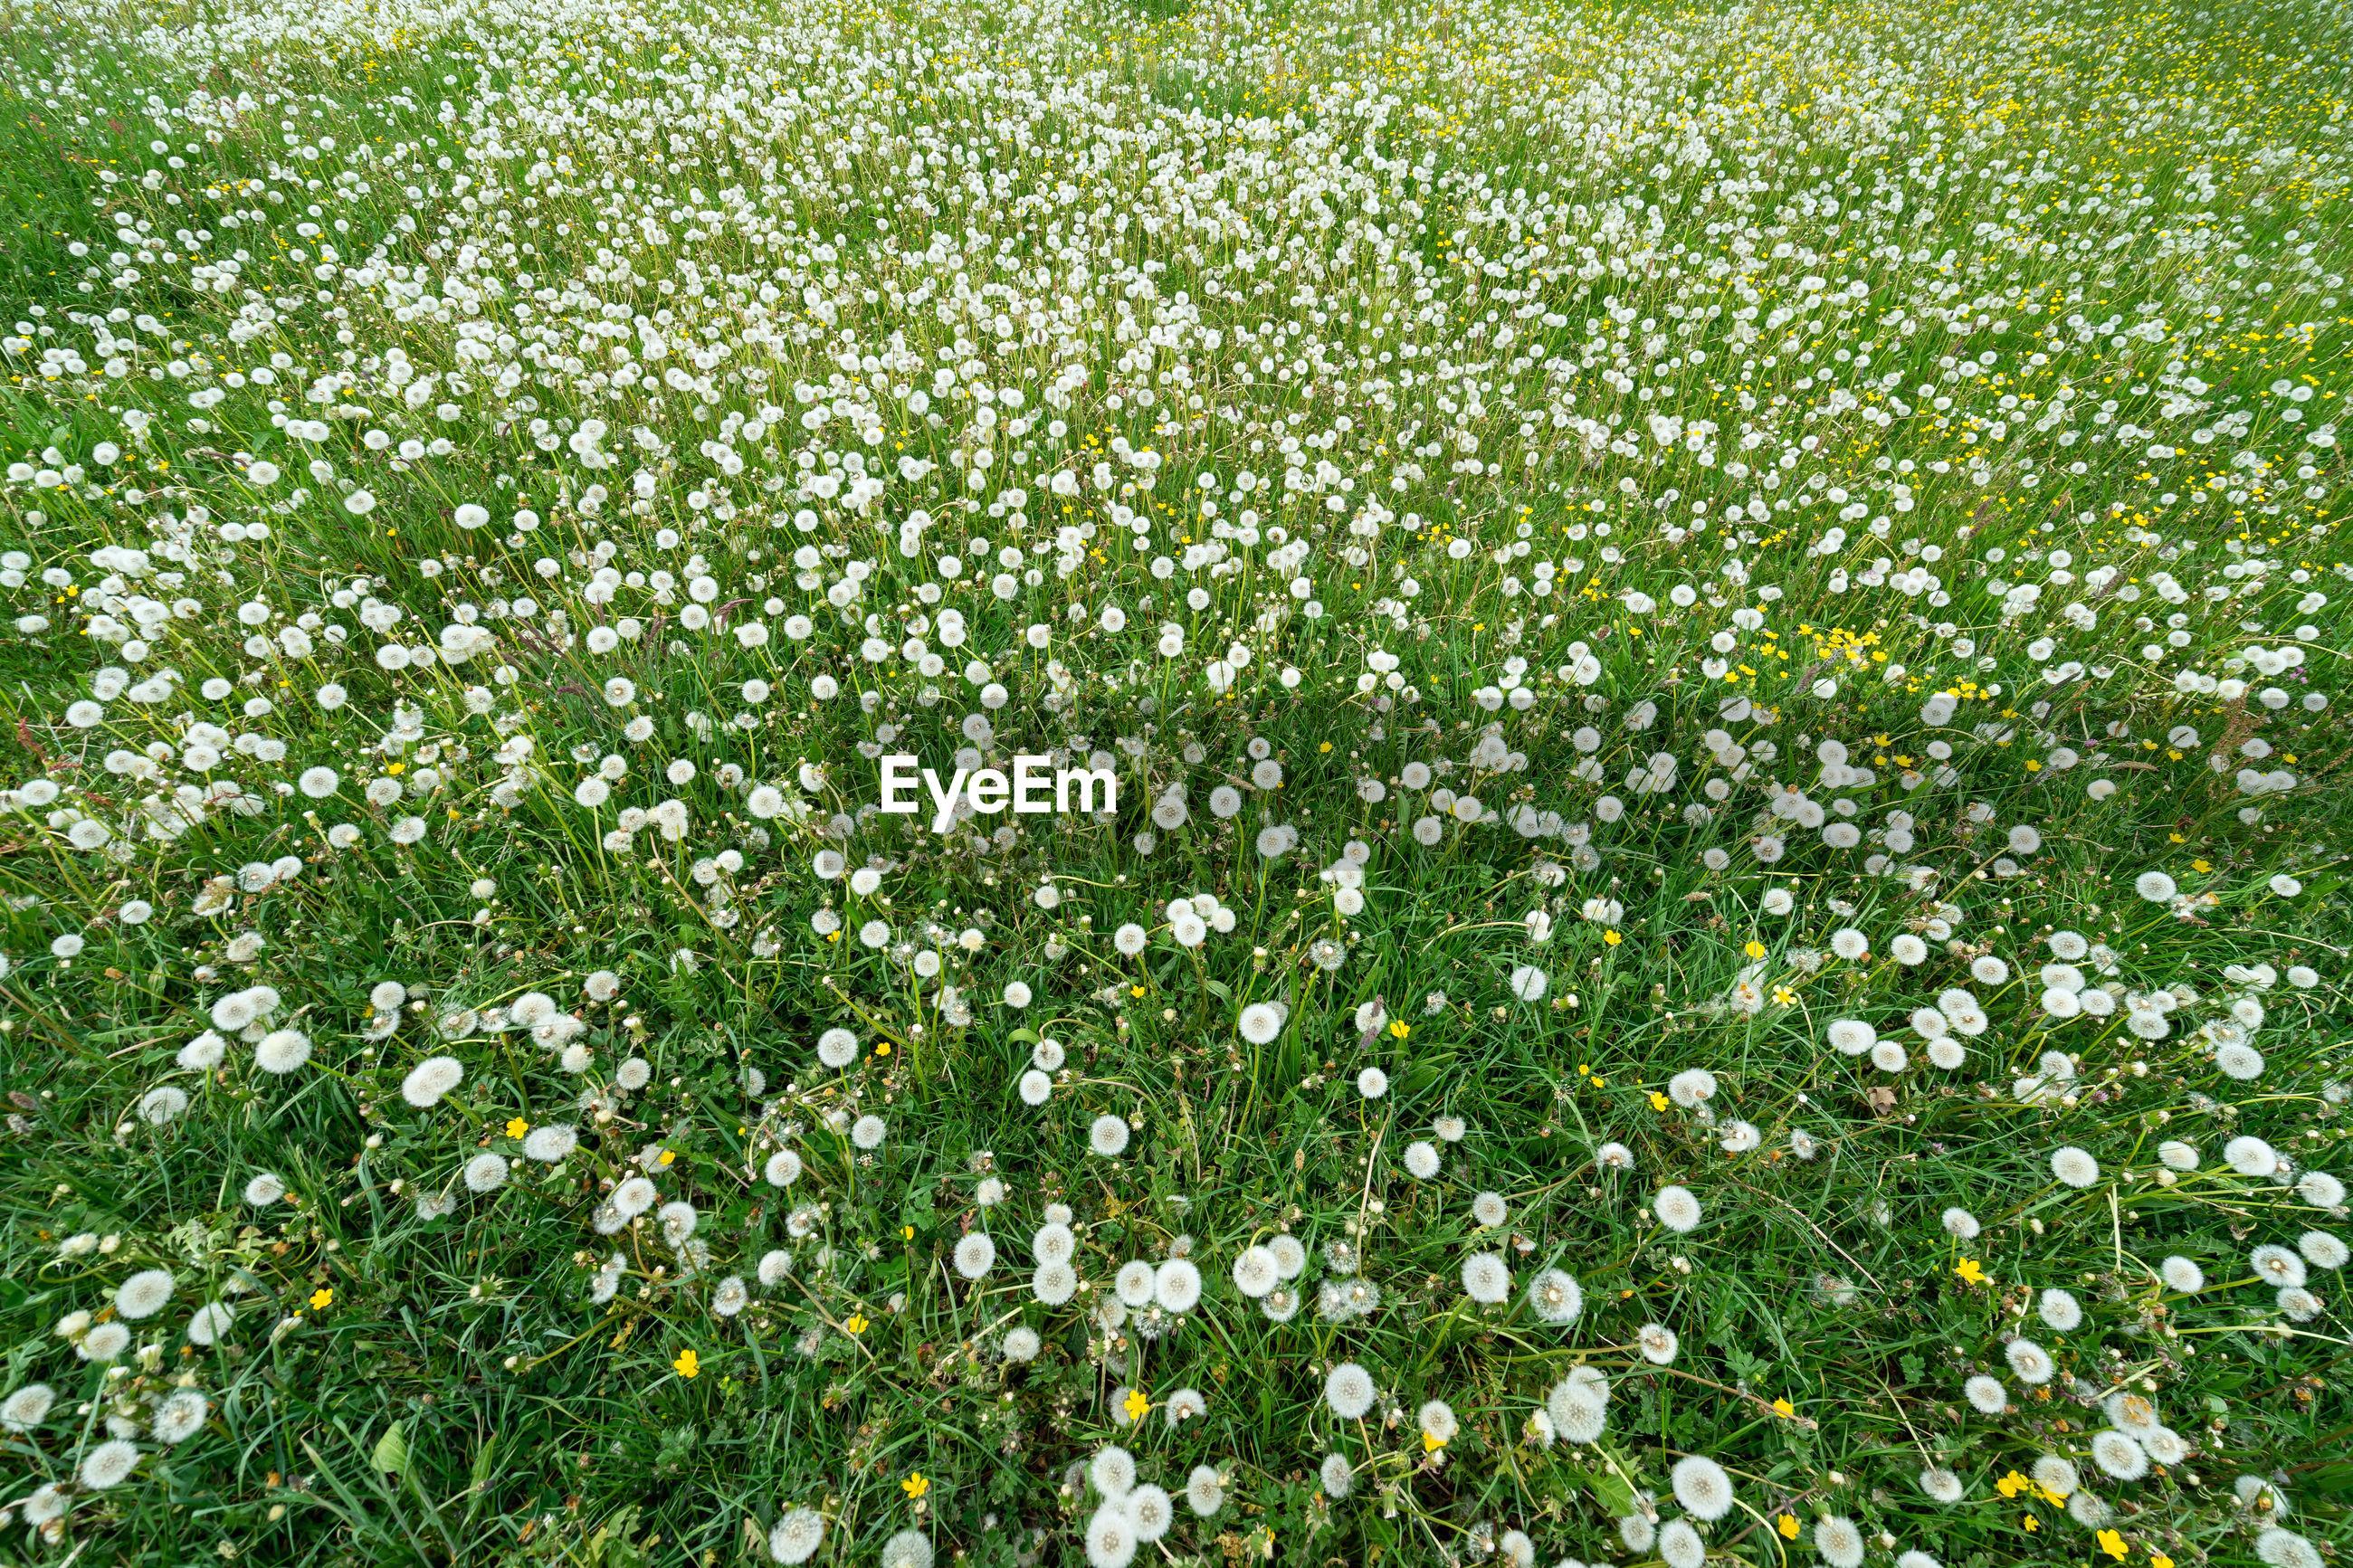 WHITE FLOWERING PLANT IN FIELD